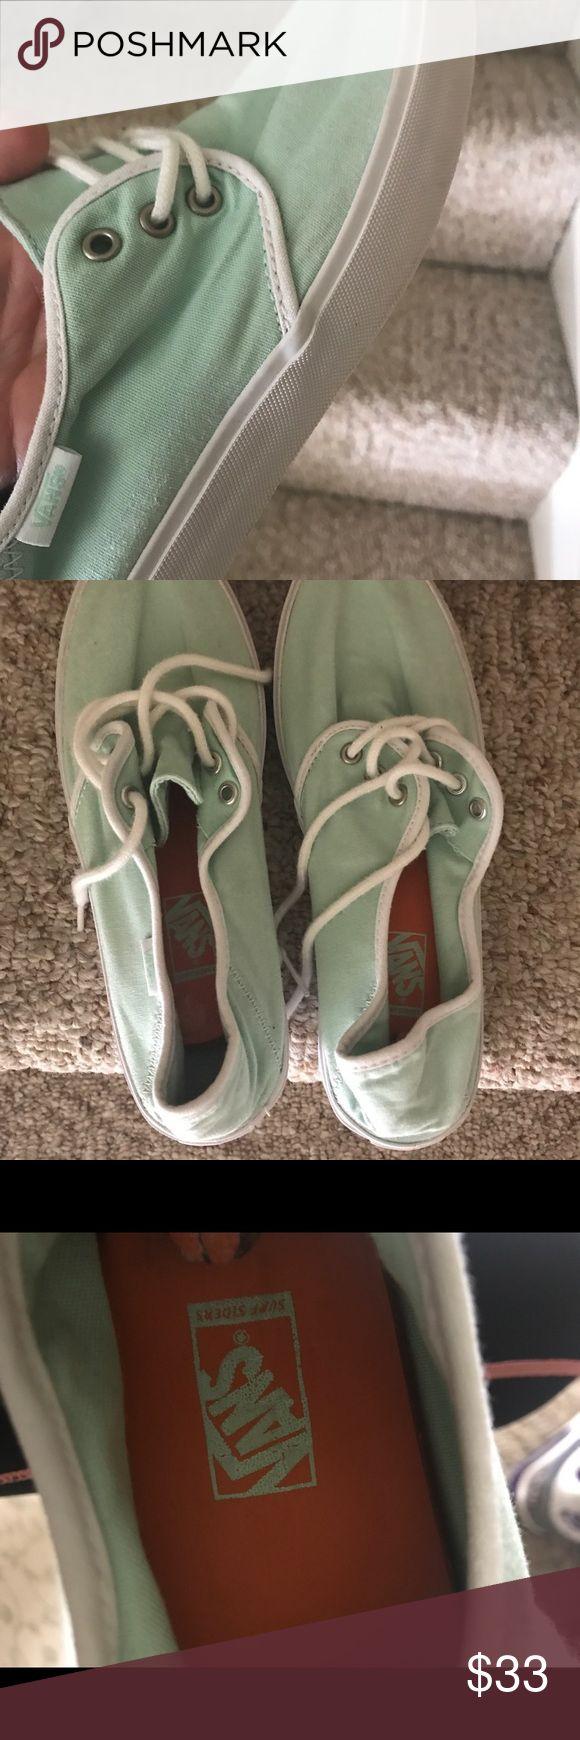 Mint Vans (Surf Siders) - Women's Brand new mint/ seafoam green Vans Surf Siders  - never worn! Vans Shoes Sneakers